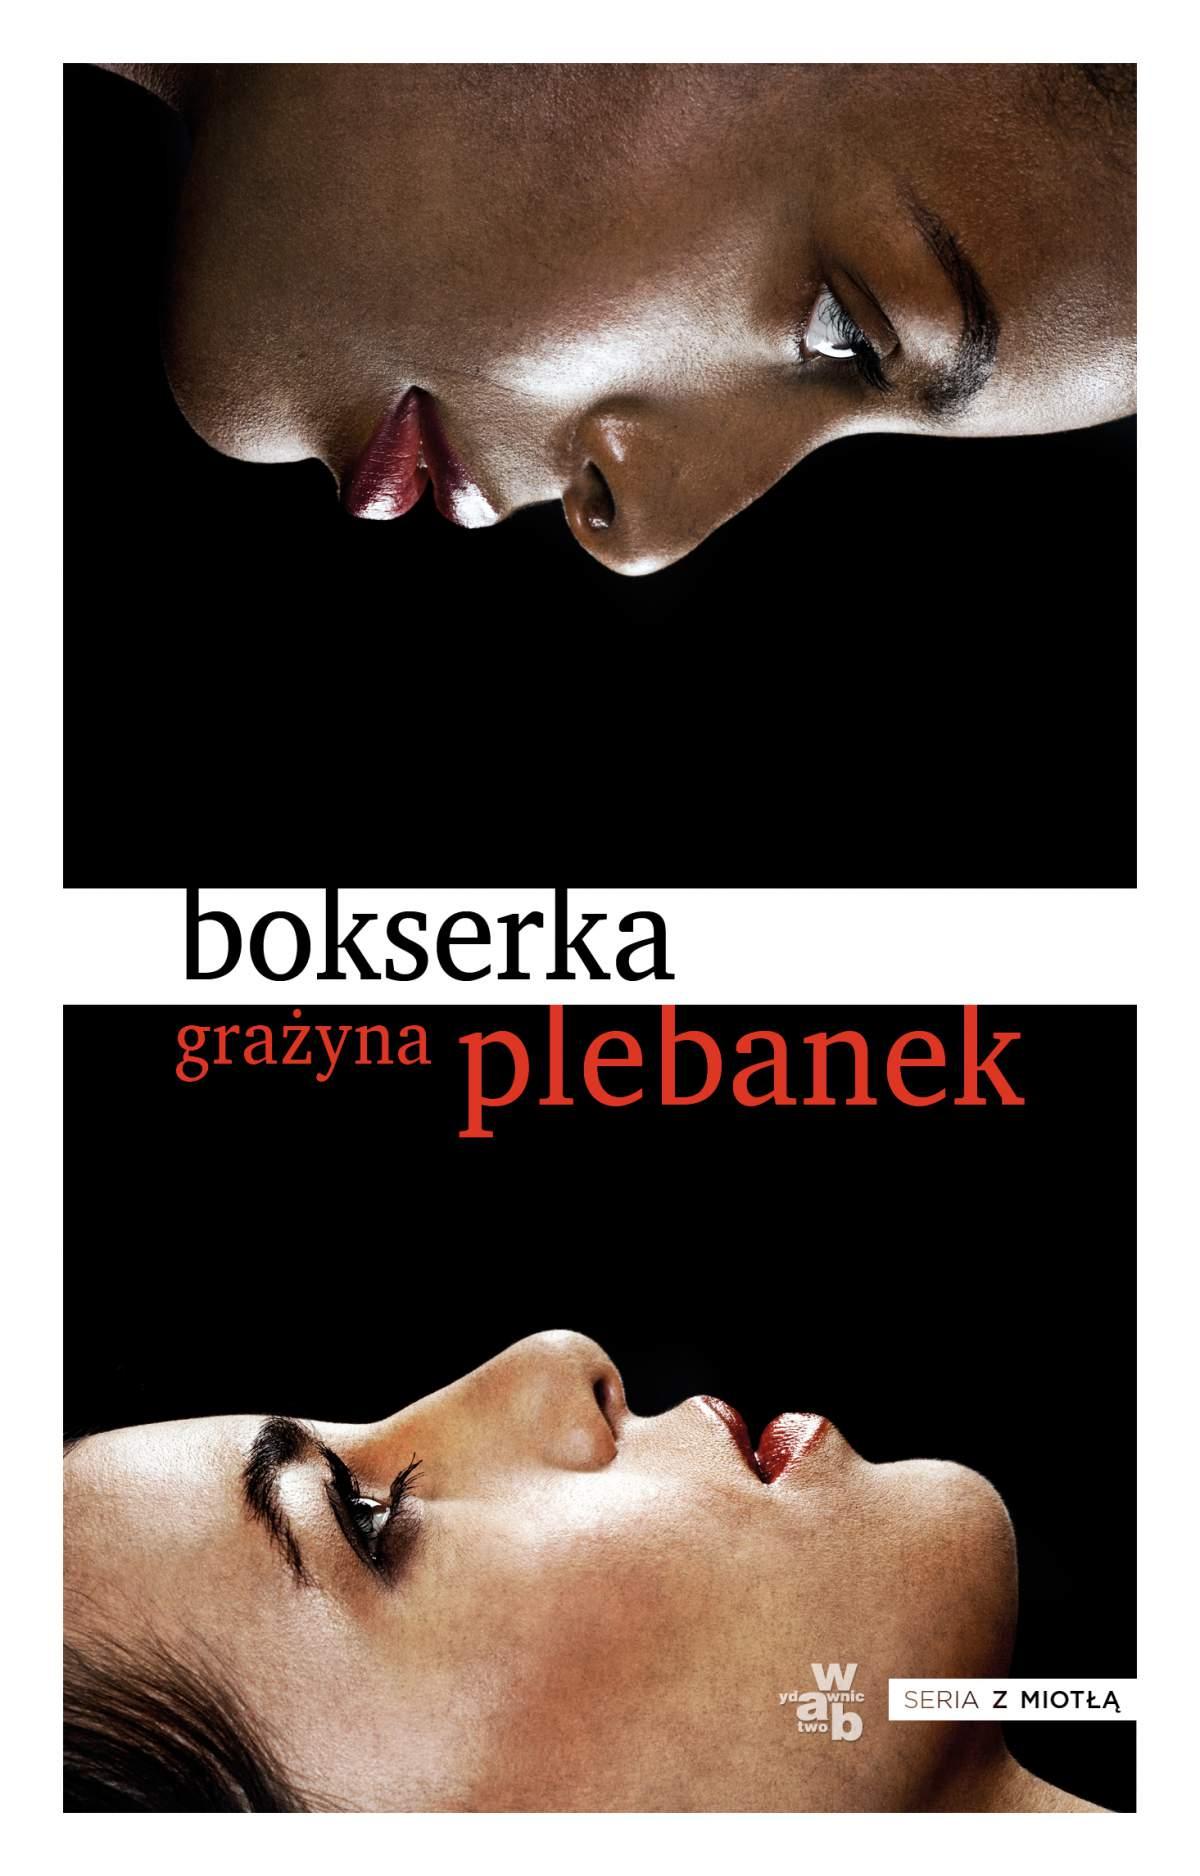 Bokserka - Ebook (Książka na Kindle) do pobrania w formacie MOBI